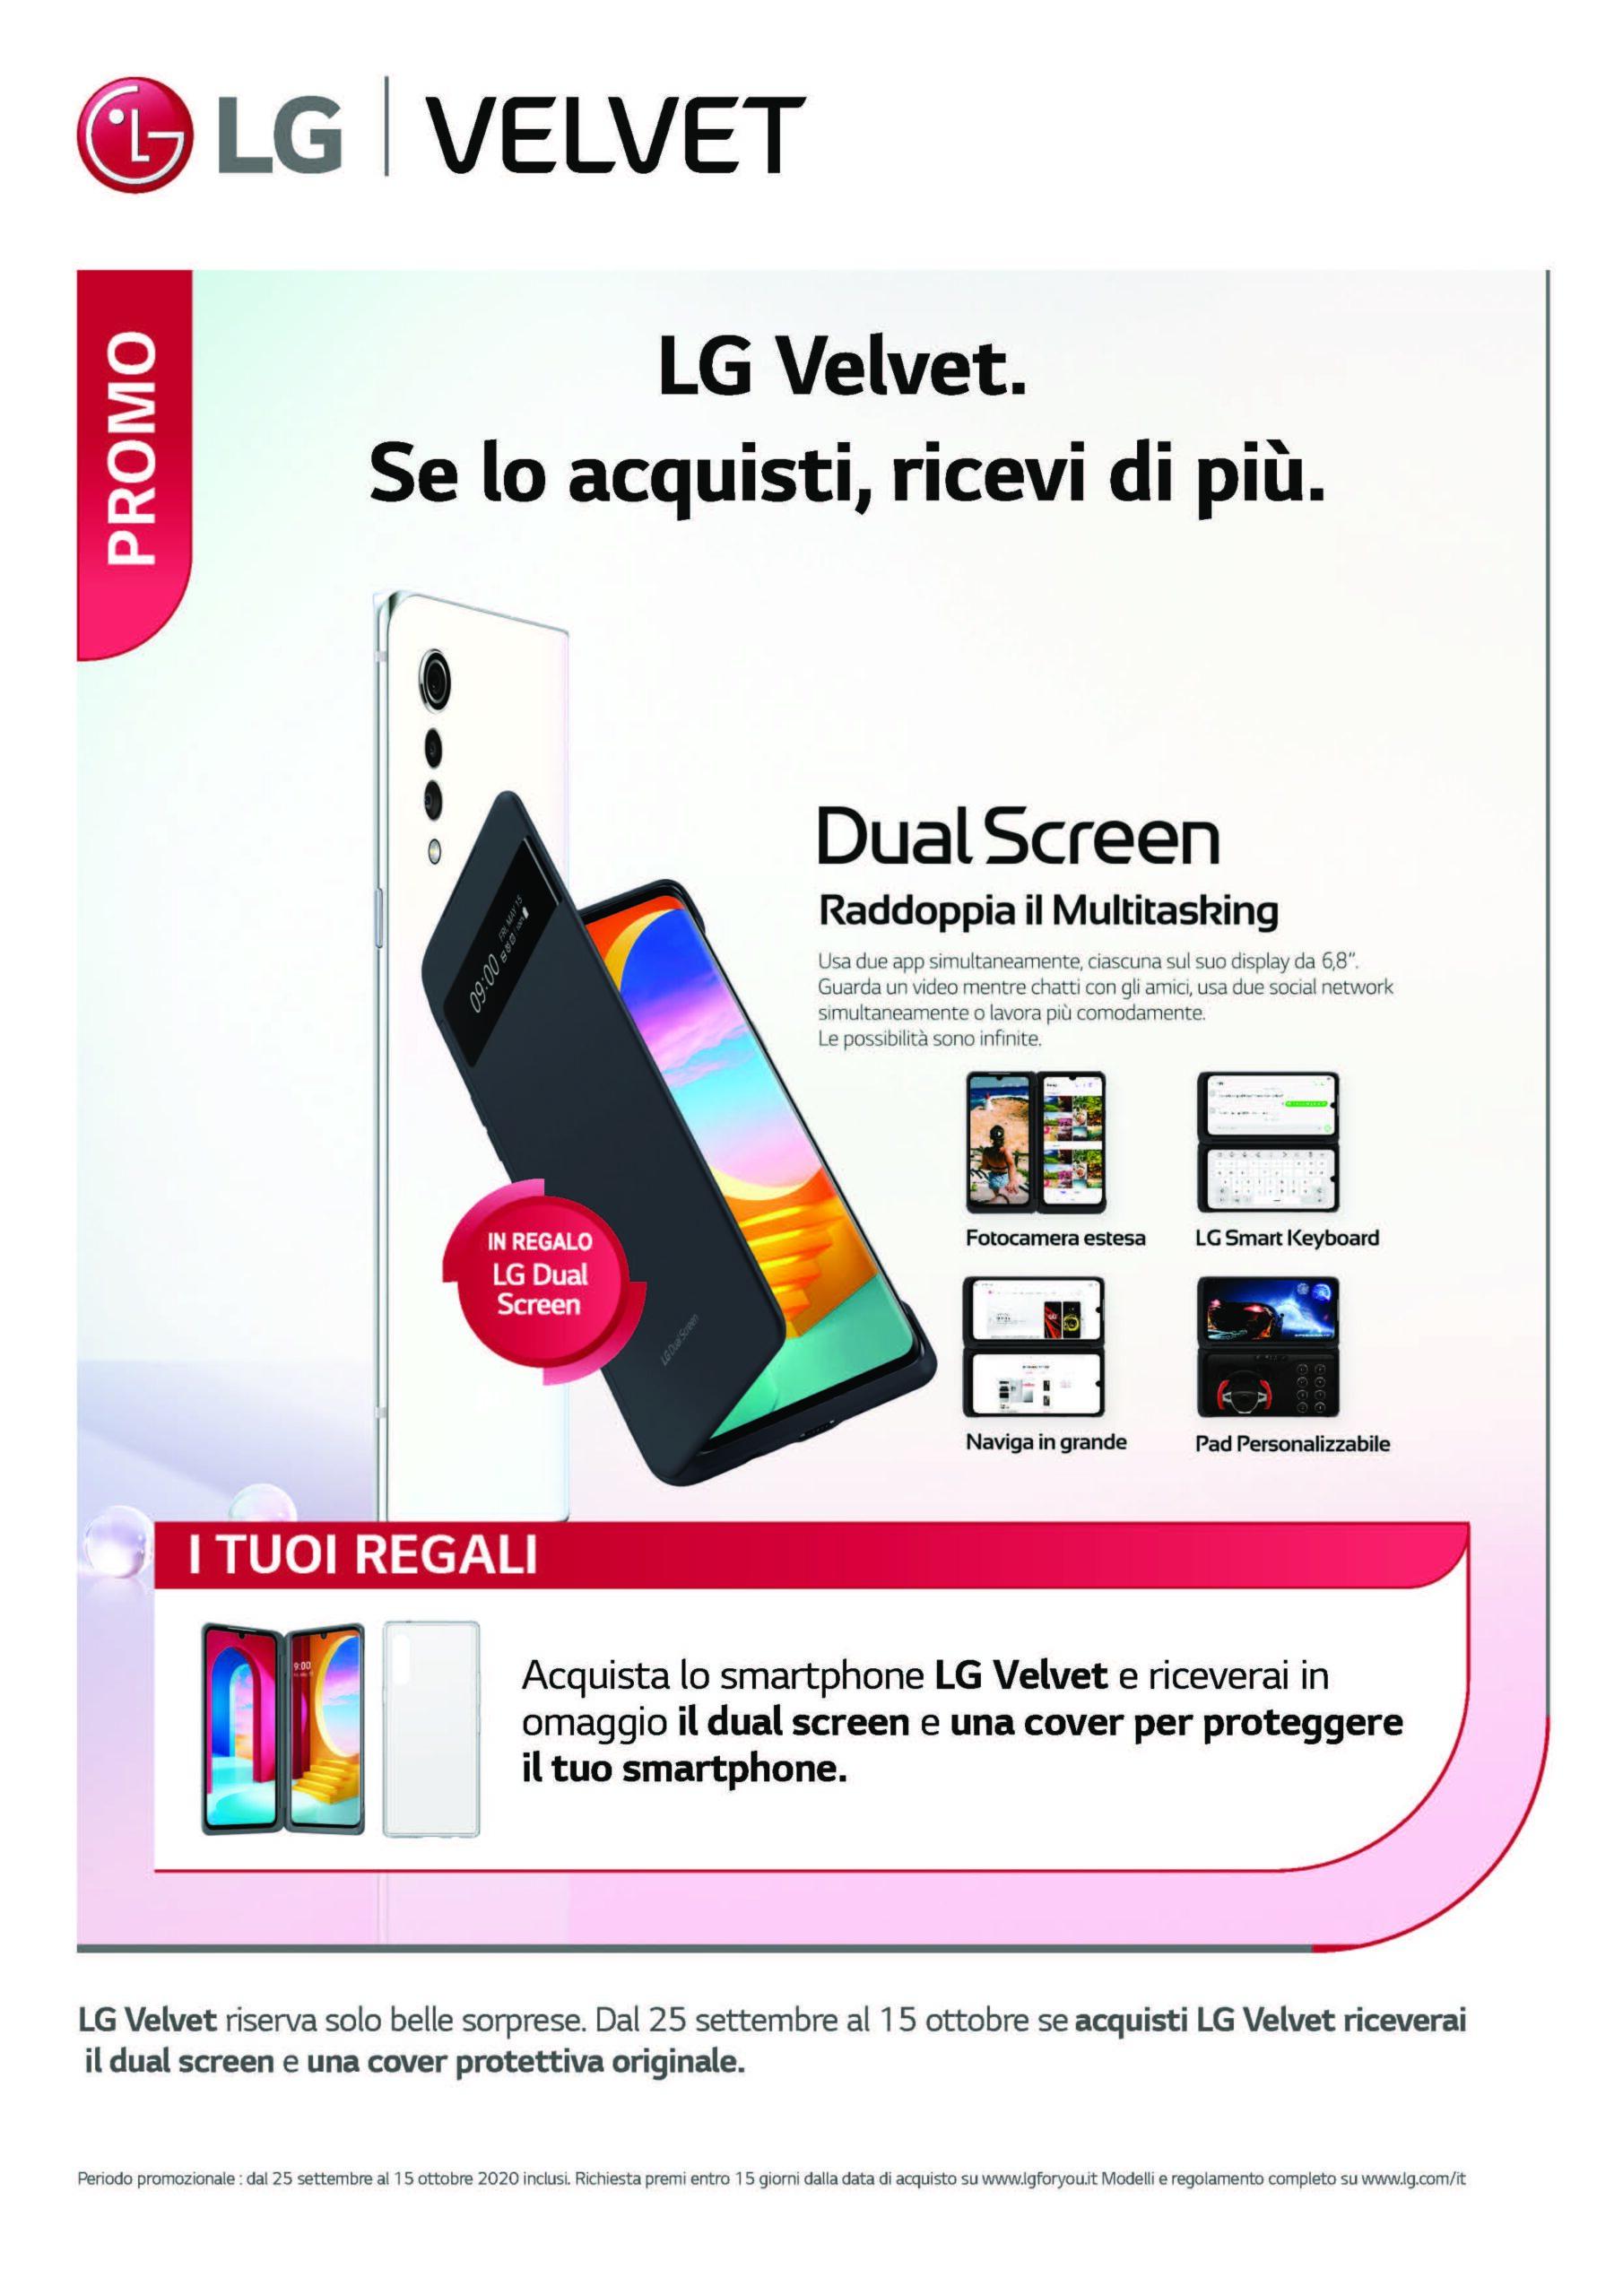 lg velvet promozione dual screen